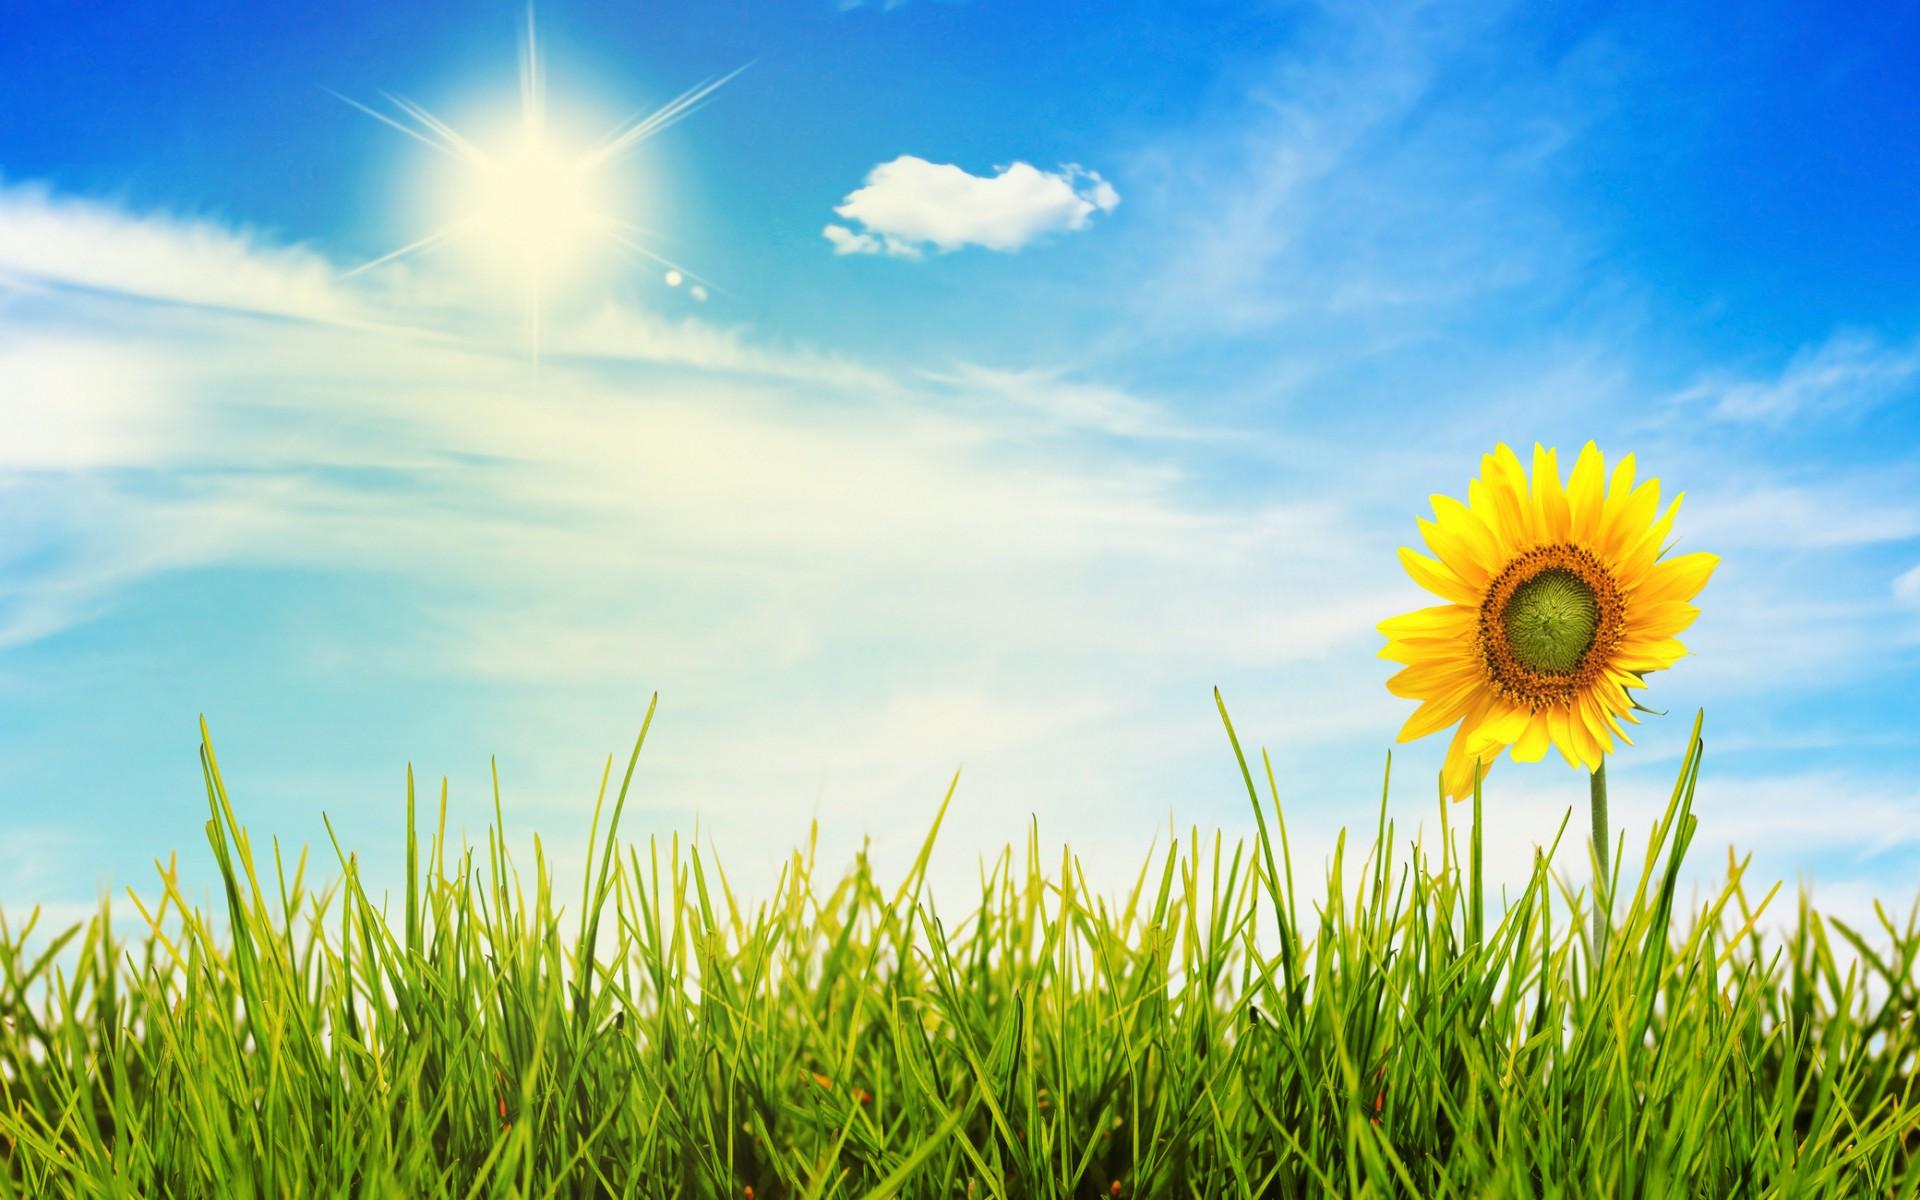 Sunny Day Best Wallpaper 25960 - Baltana